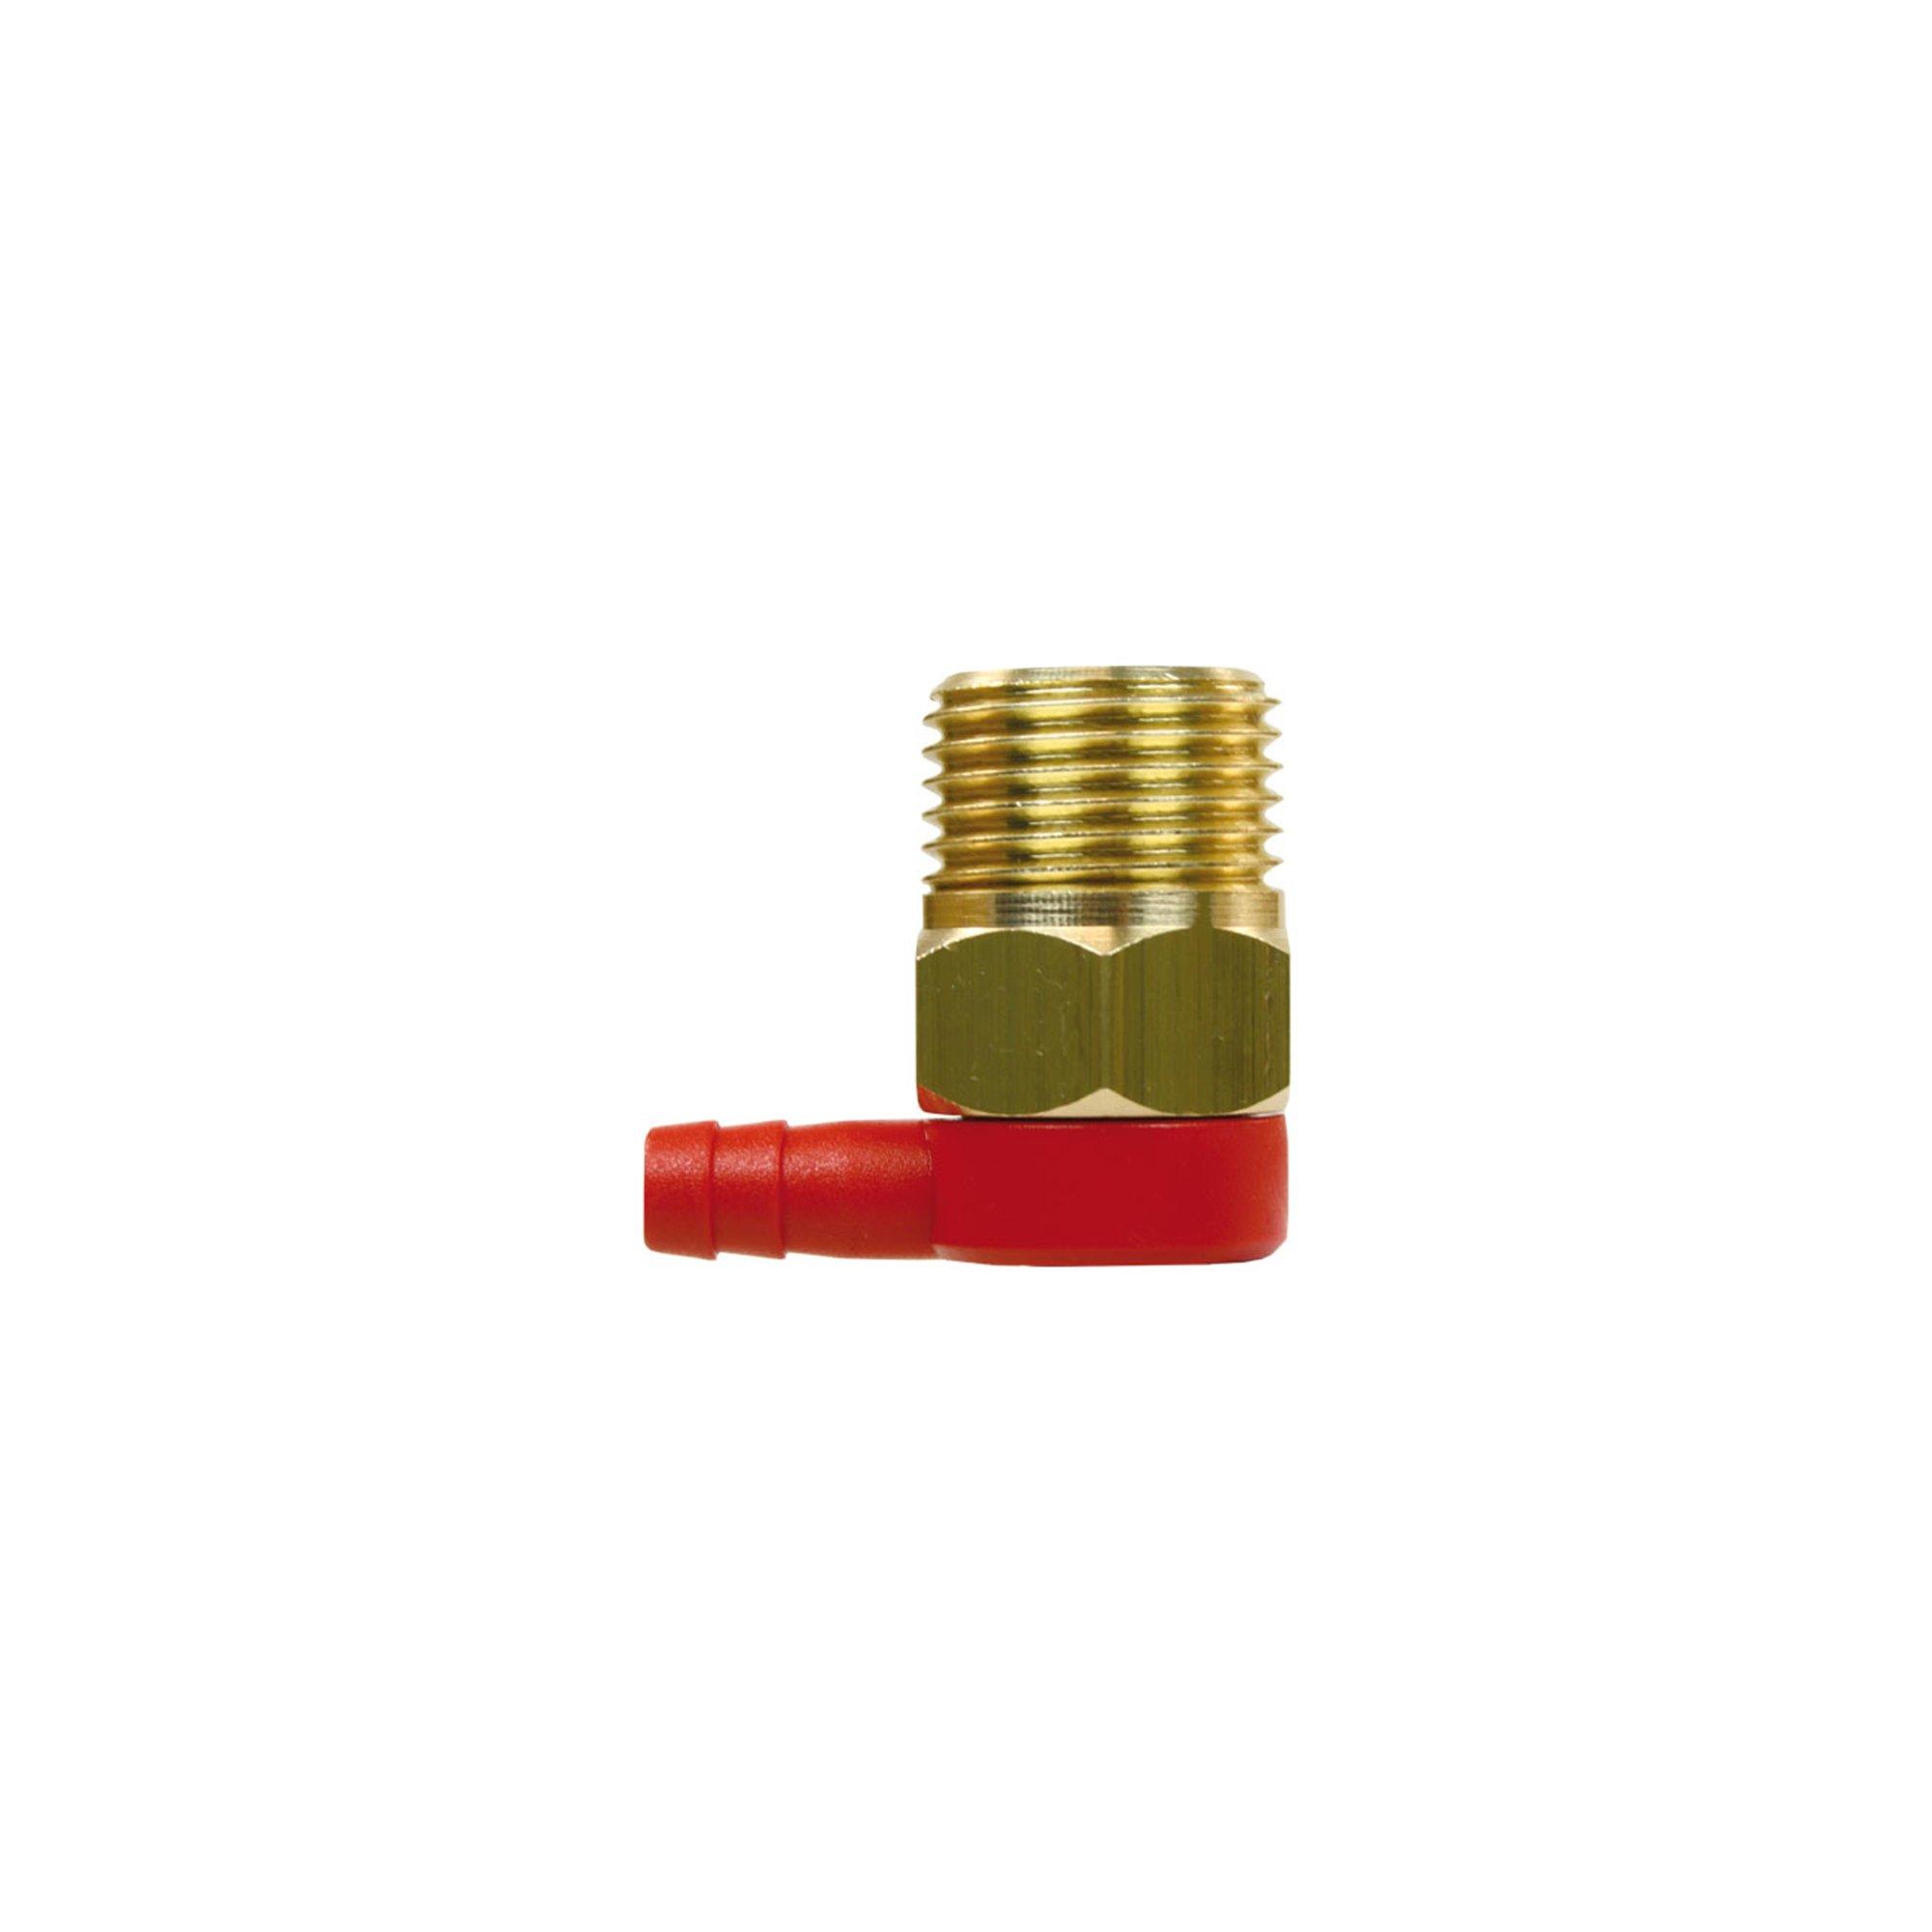 "R+M de Wit Thermoventil mit Fühler aus Kupfer, 3/8"" AG - Tülle 6mm, Betriebstemperatur 63°C, max. 10 bar, Thermoventil VT6 1/2"